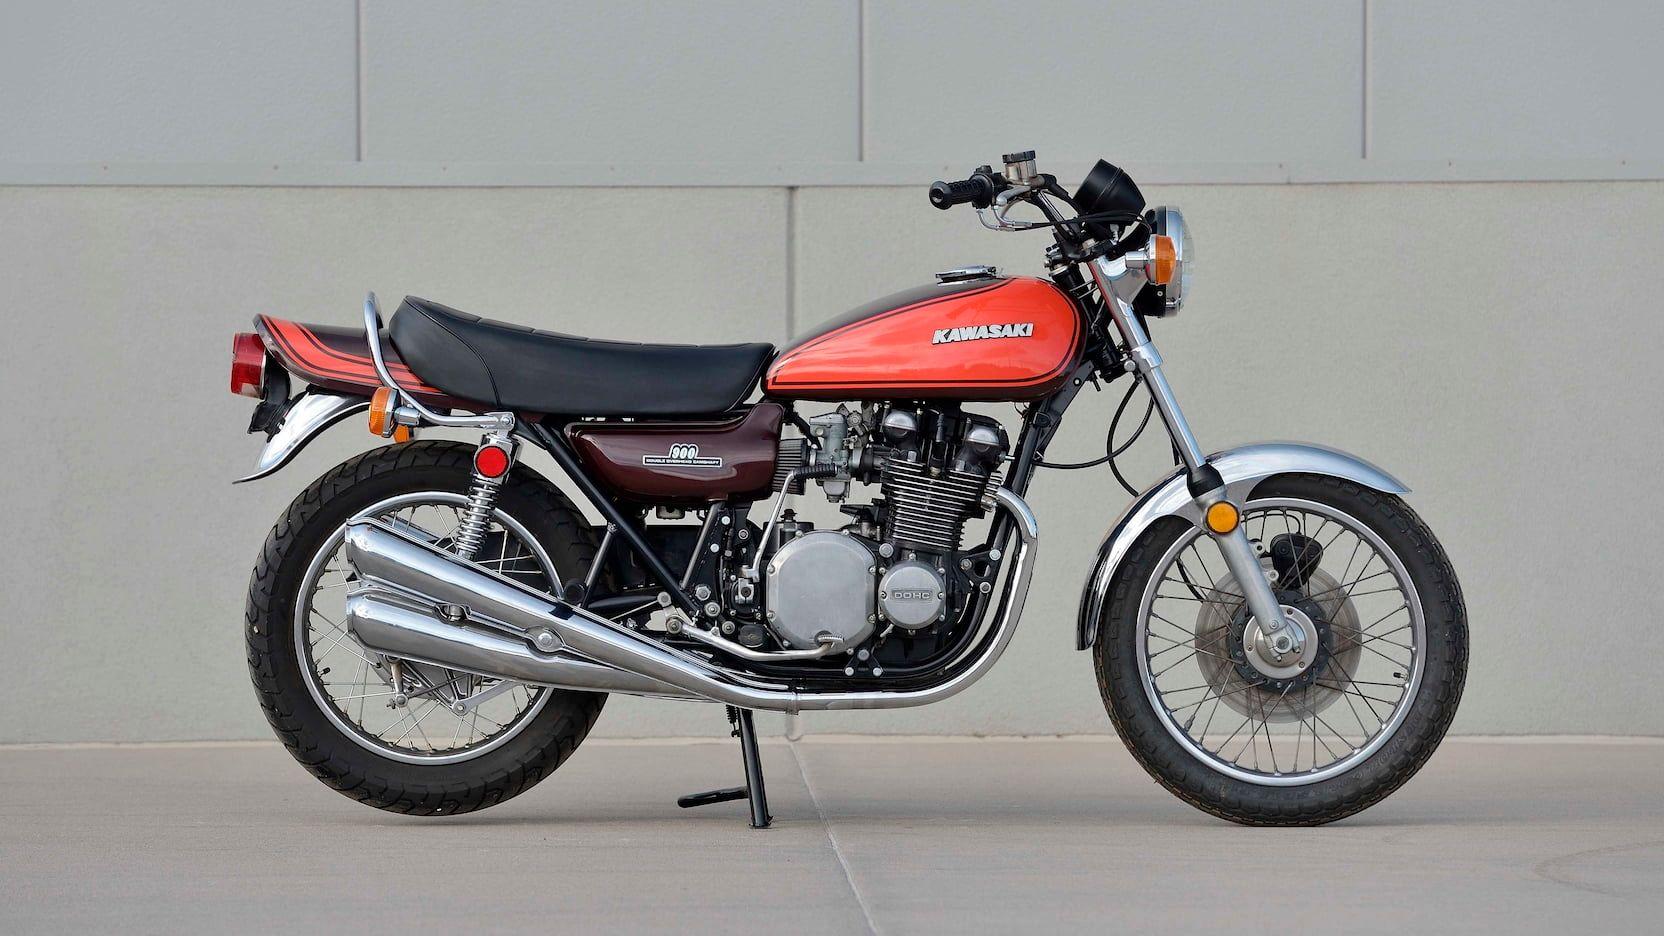 The Kawasaki Z1 was the original Eddie Lawson Replica that led to the modern Z900RS